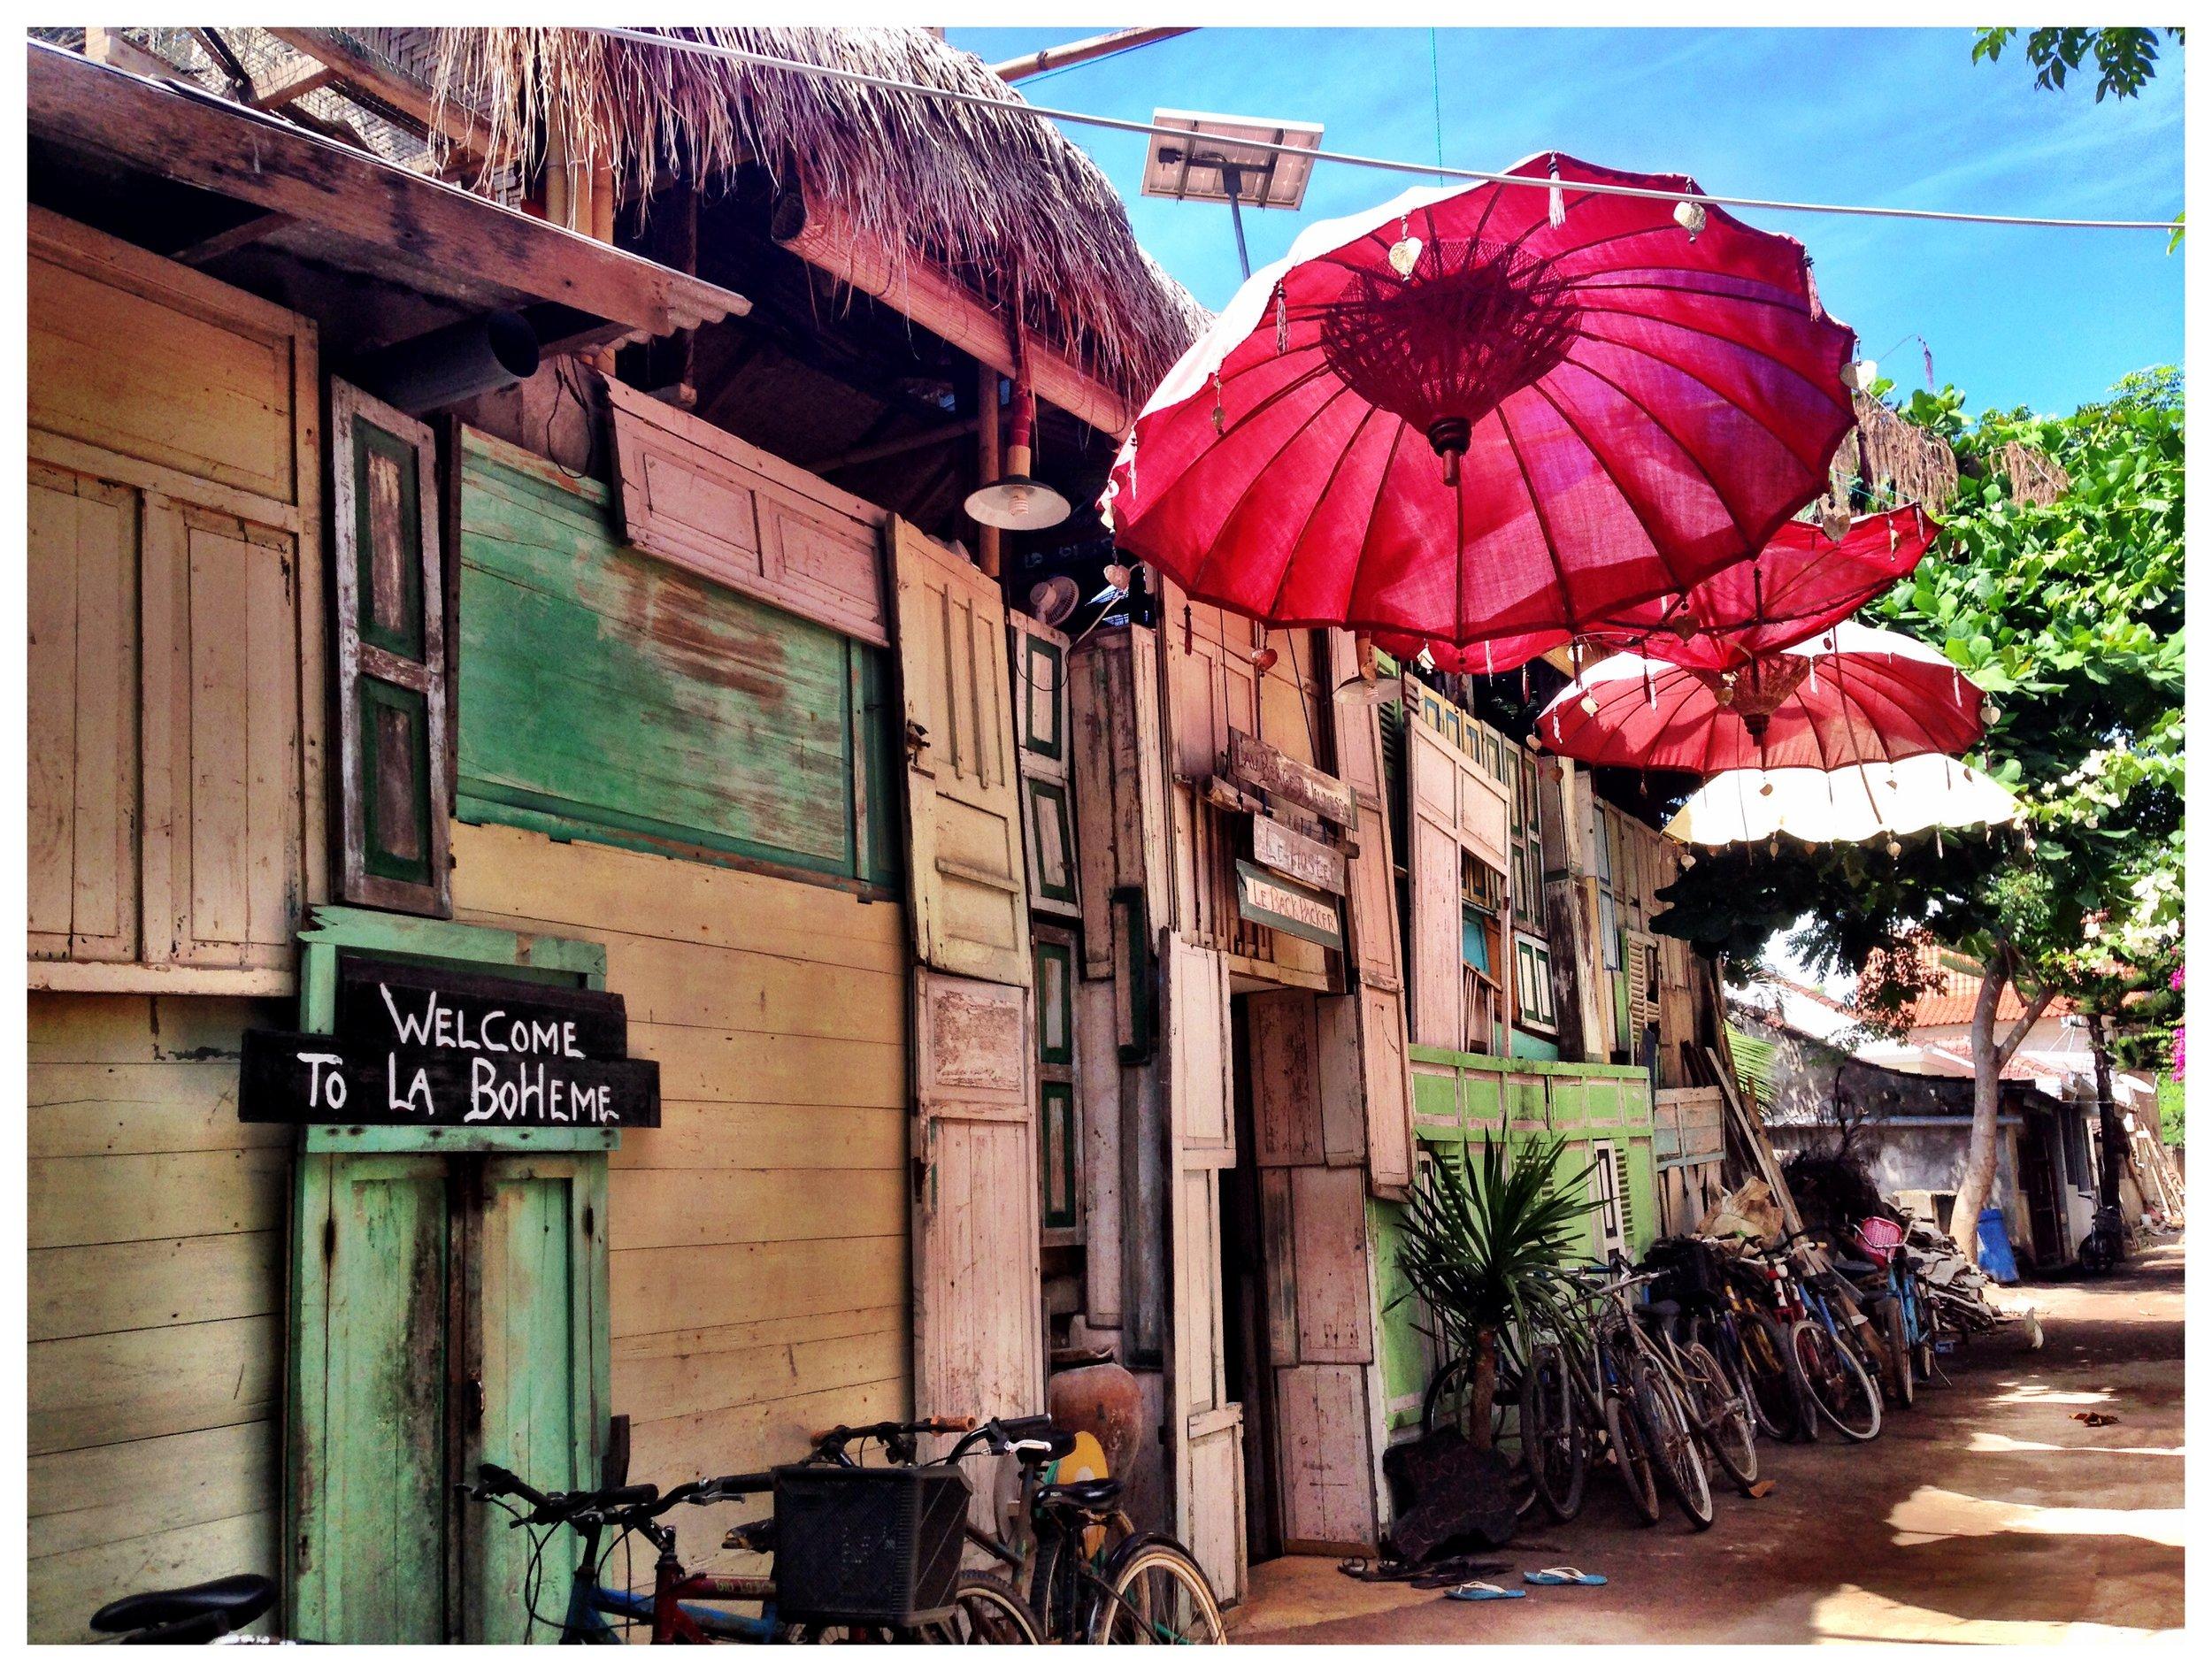 Bali alley umbrellas travel 3 days